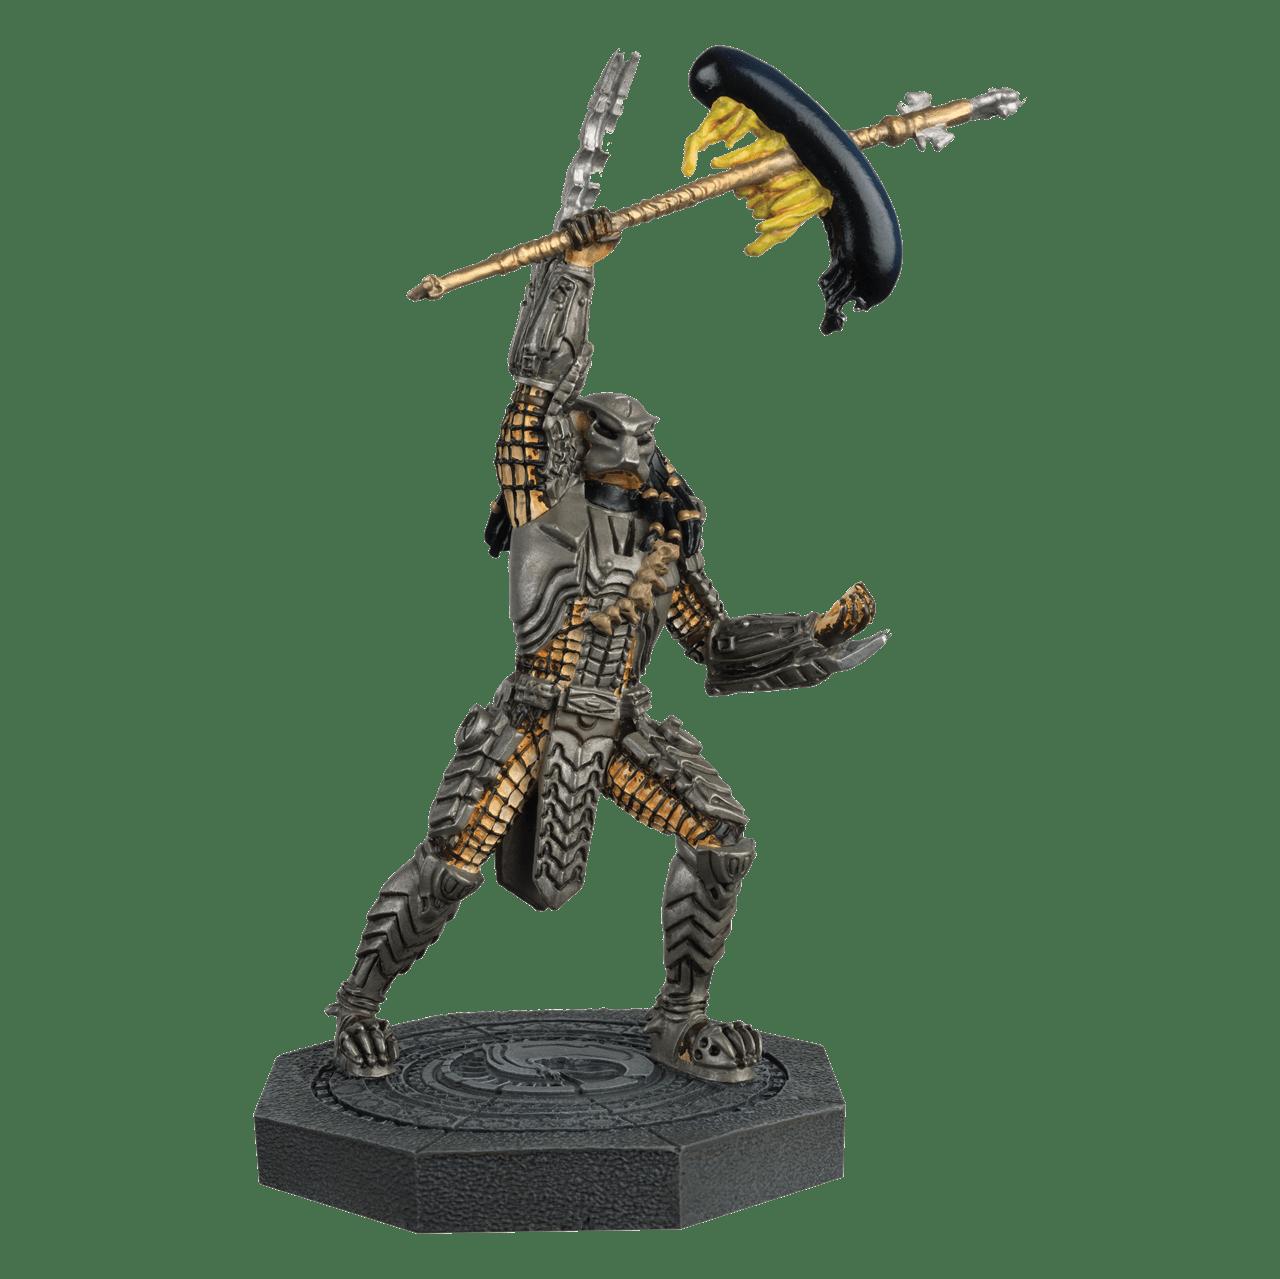 Scar Predator Figurine: Hero Collector - 1